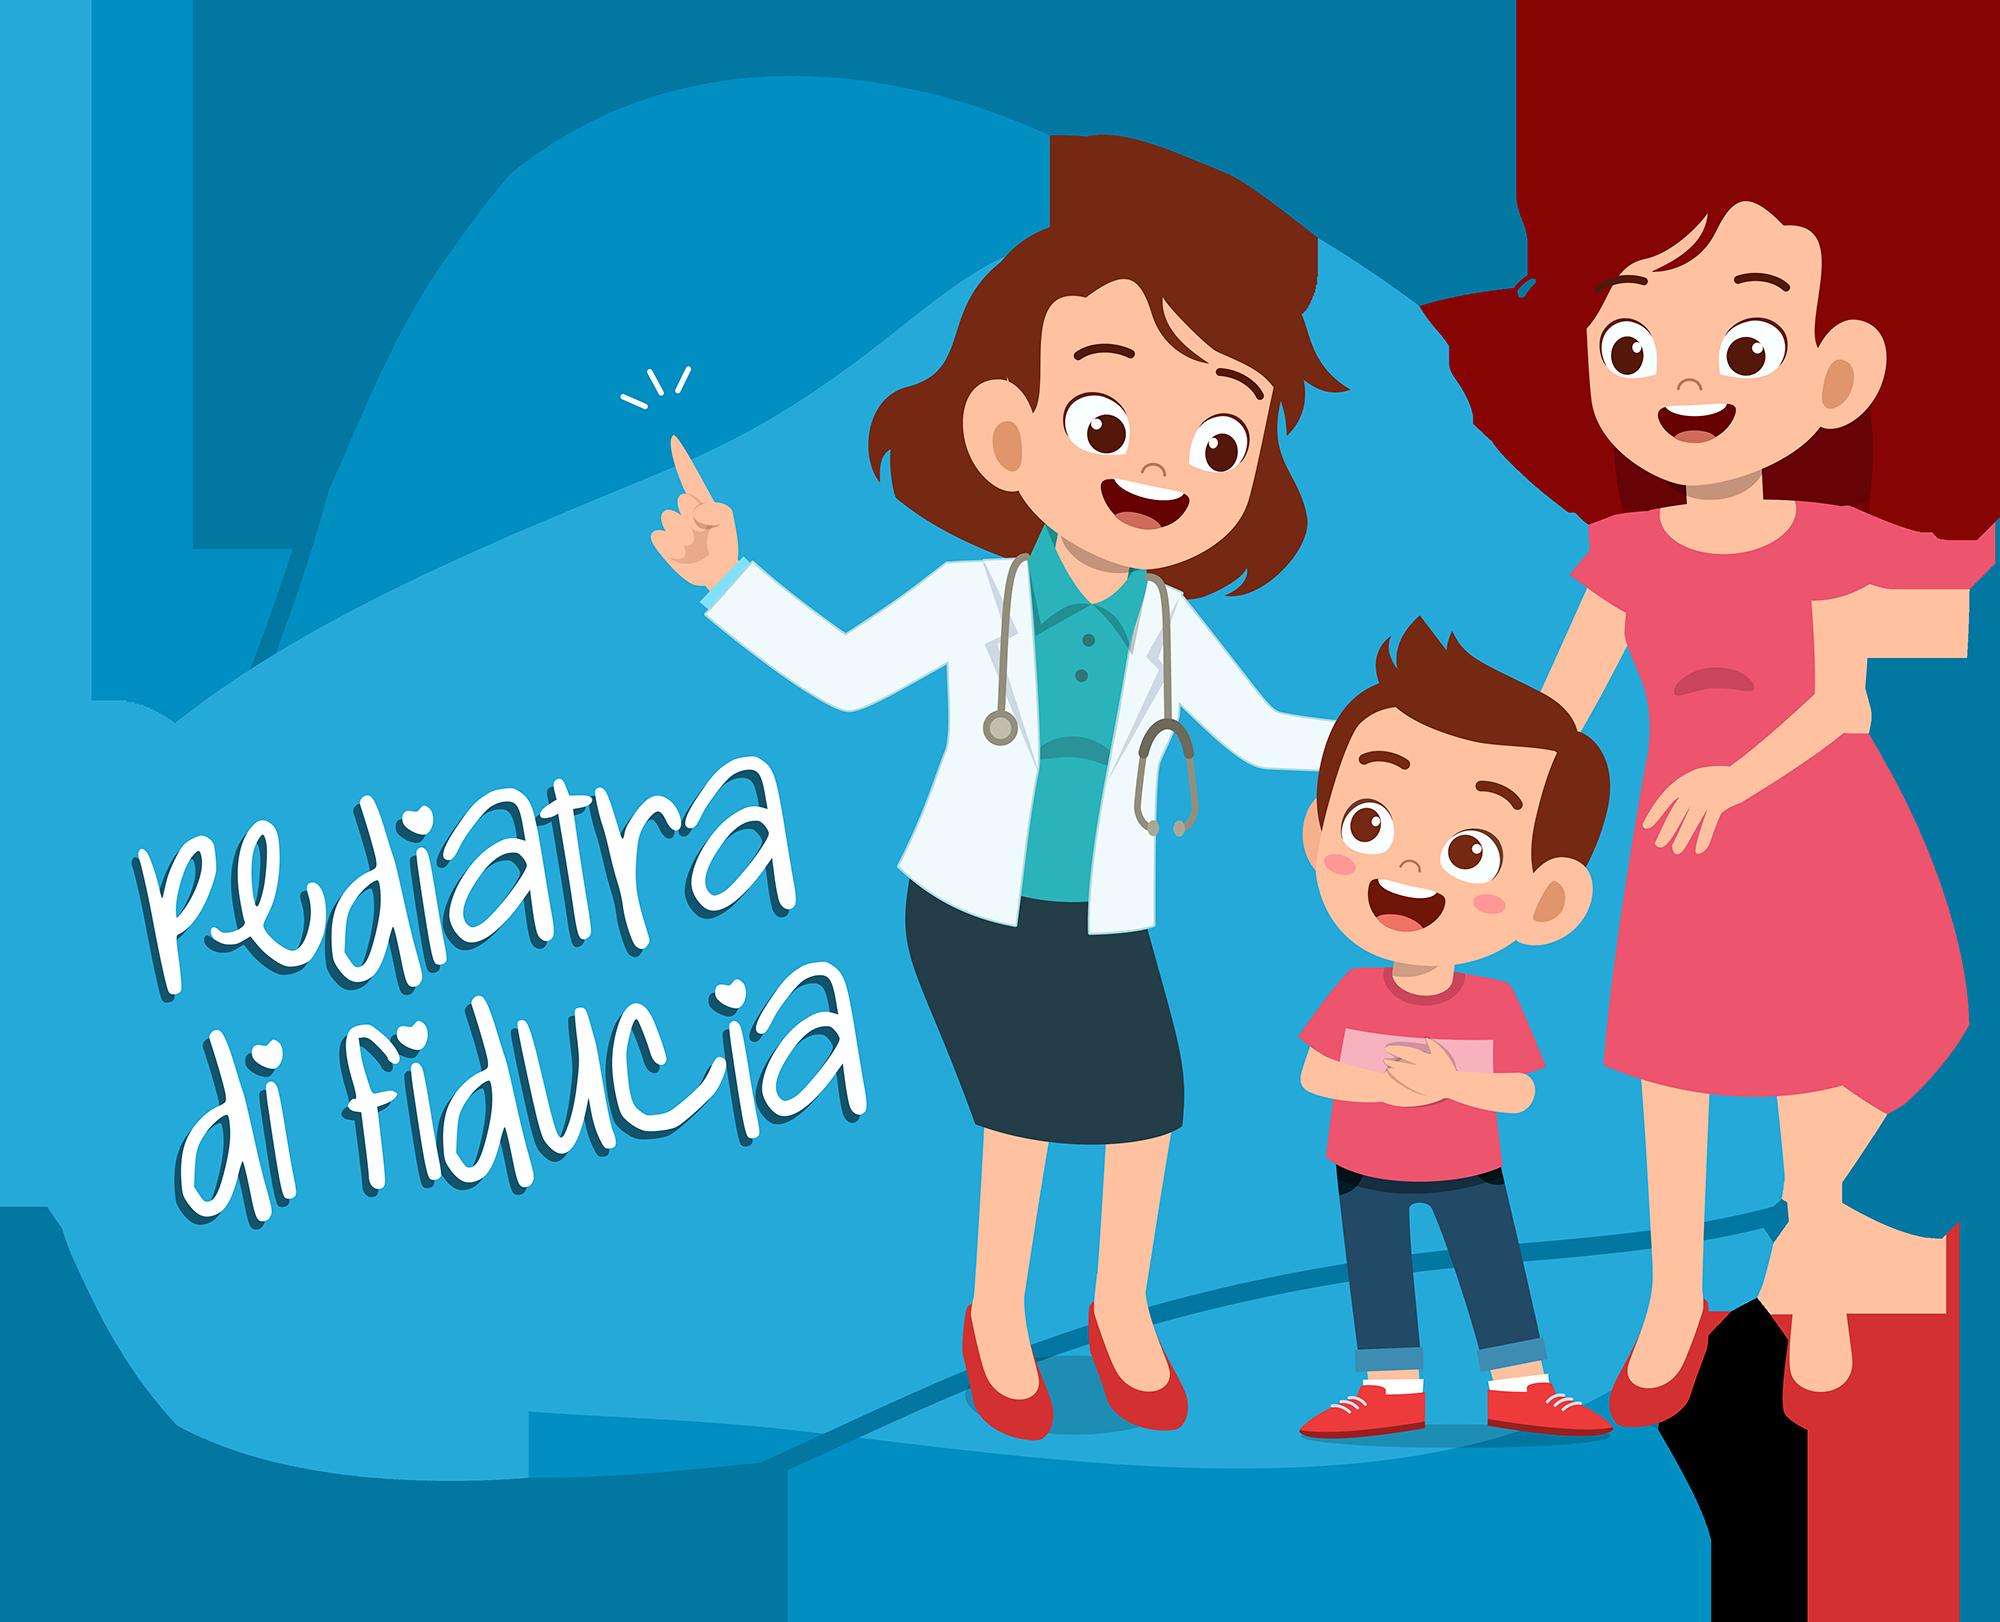 Pediatra di fiducia